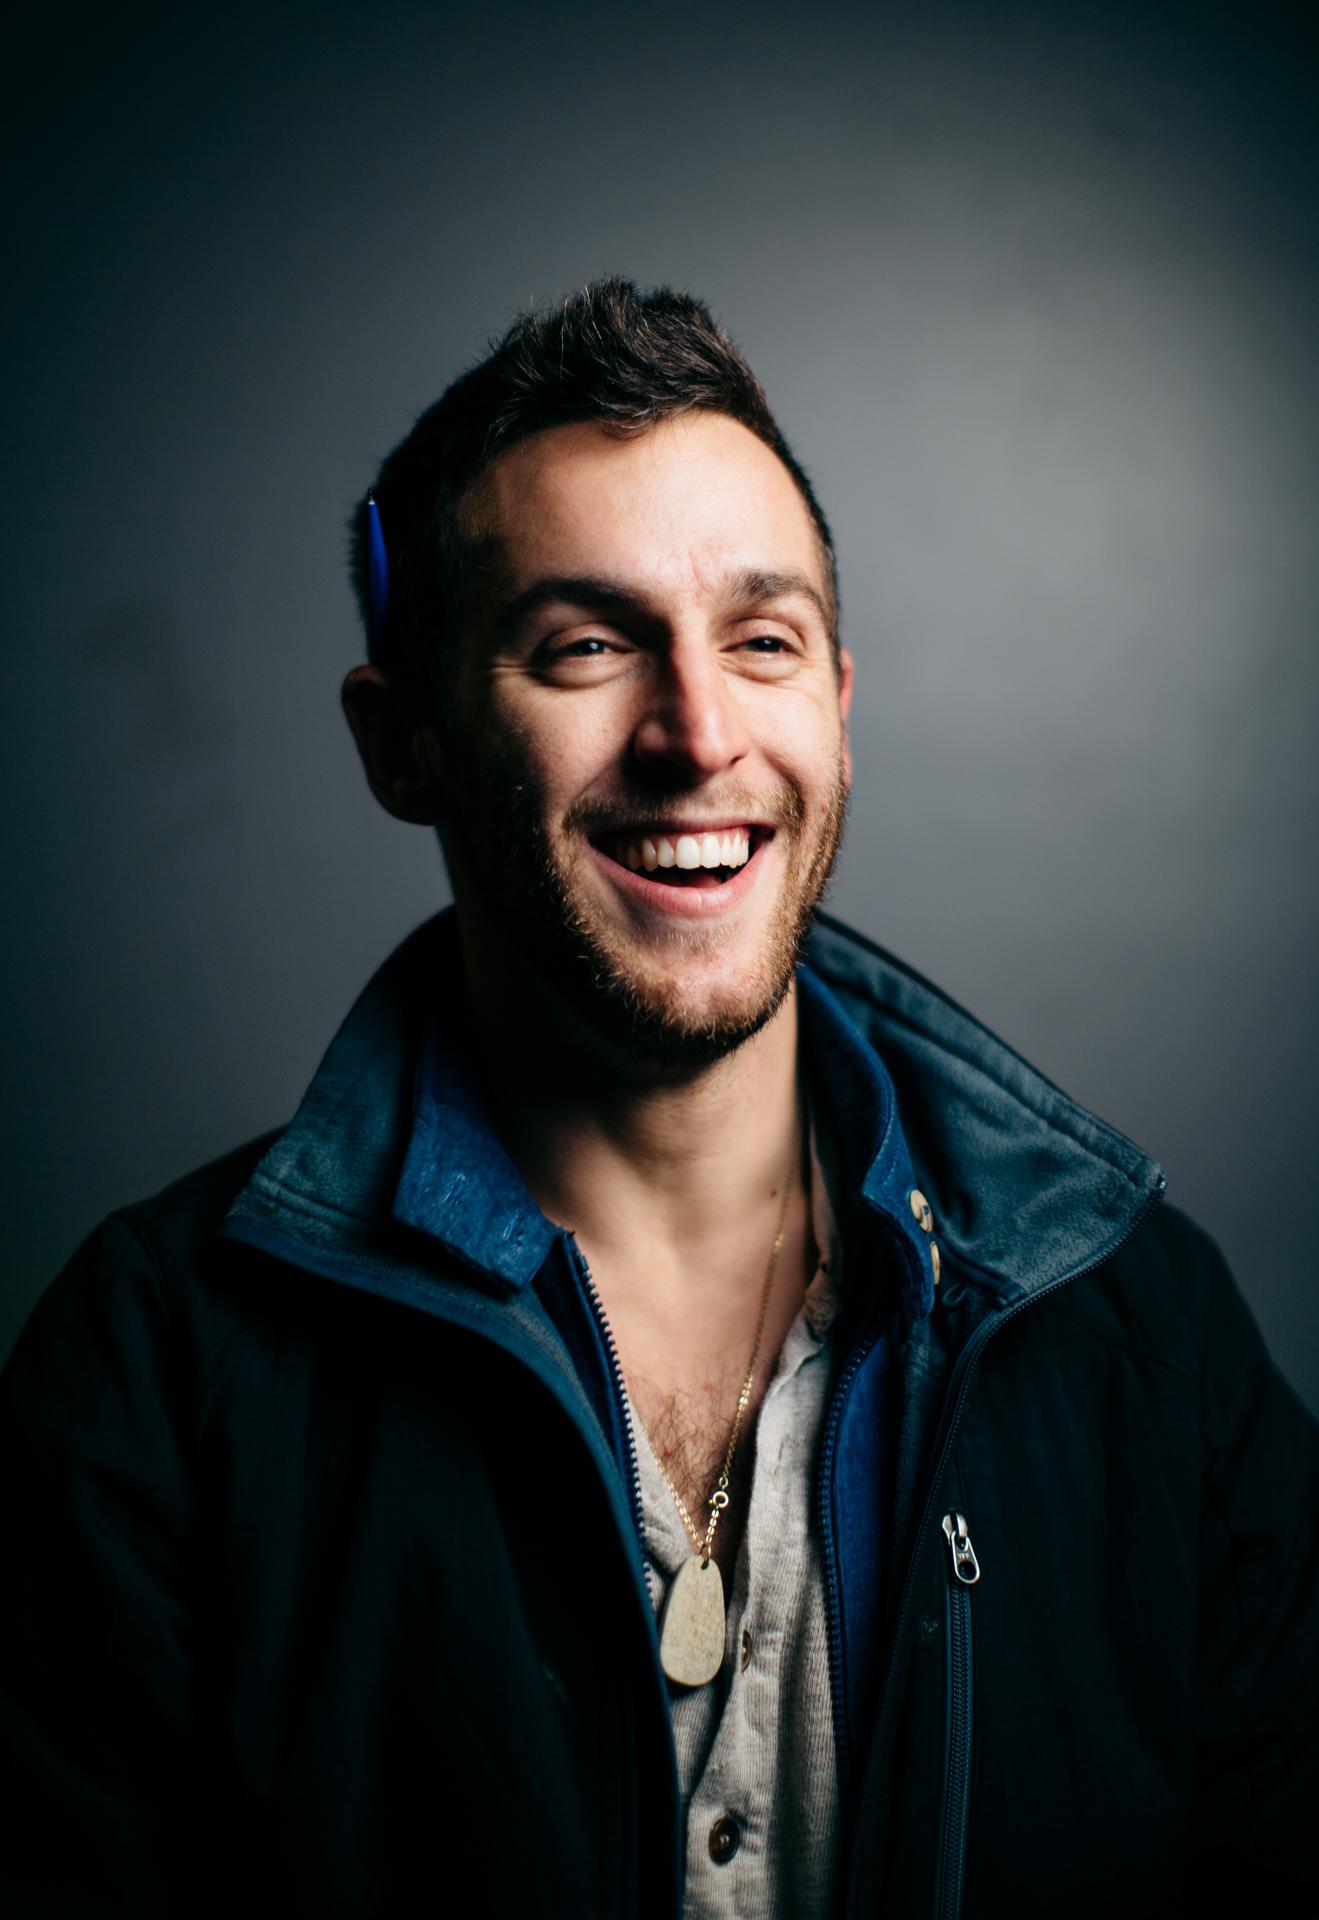 Blake Stepan - Musician Portrait Photography - Durham, NC